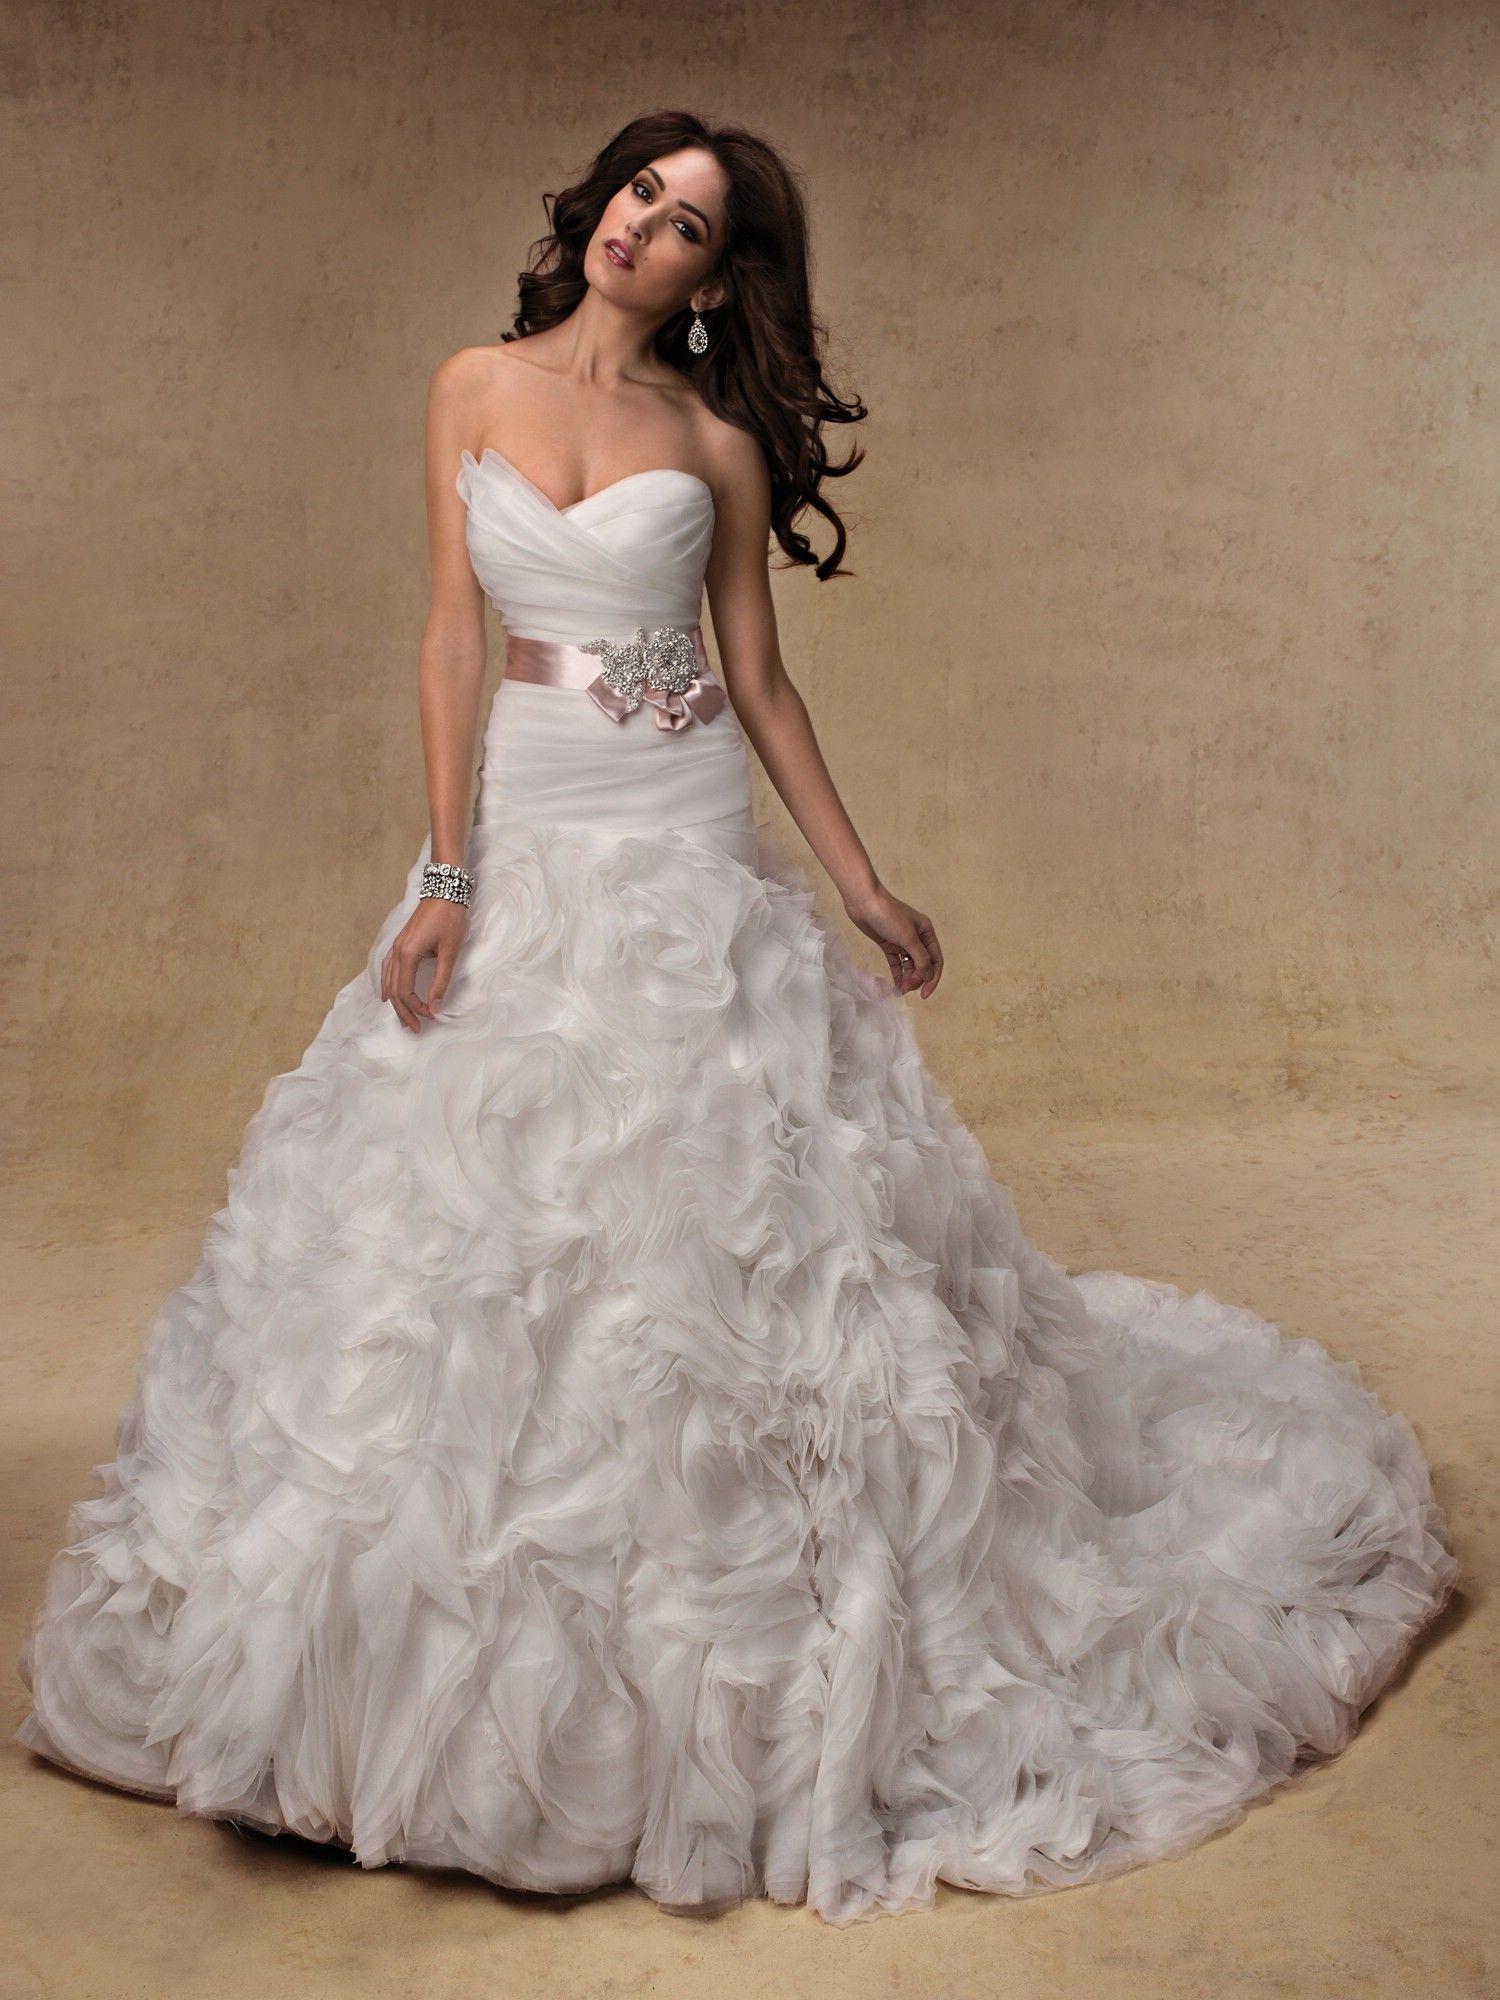 Unique Maggie Sottero Wedding Dresses Style Jalissa maggie sottero wedding dresses